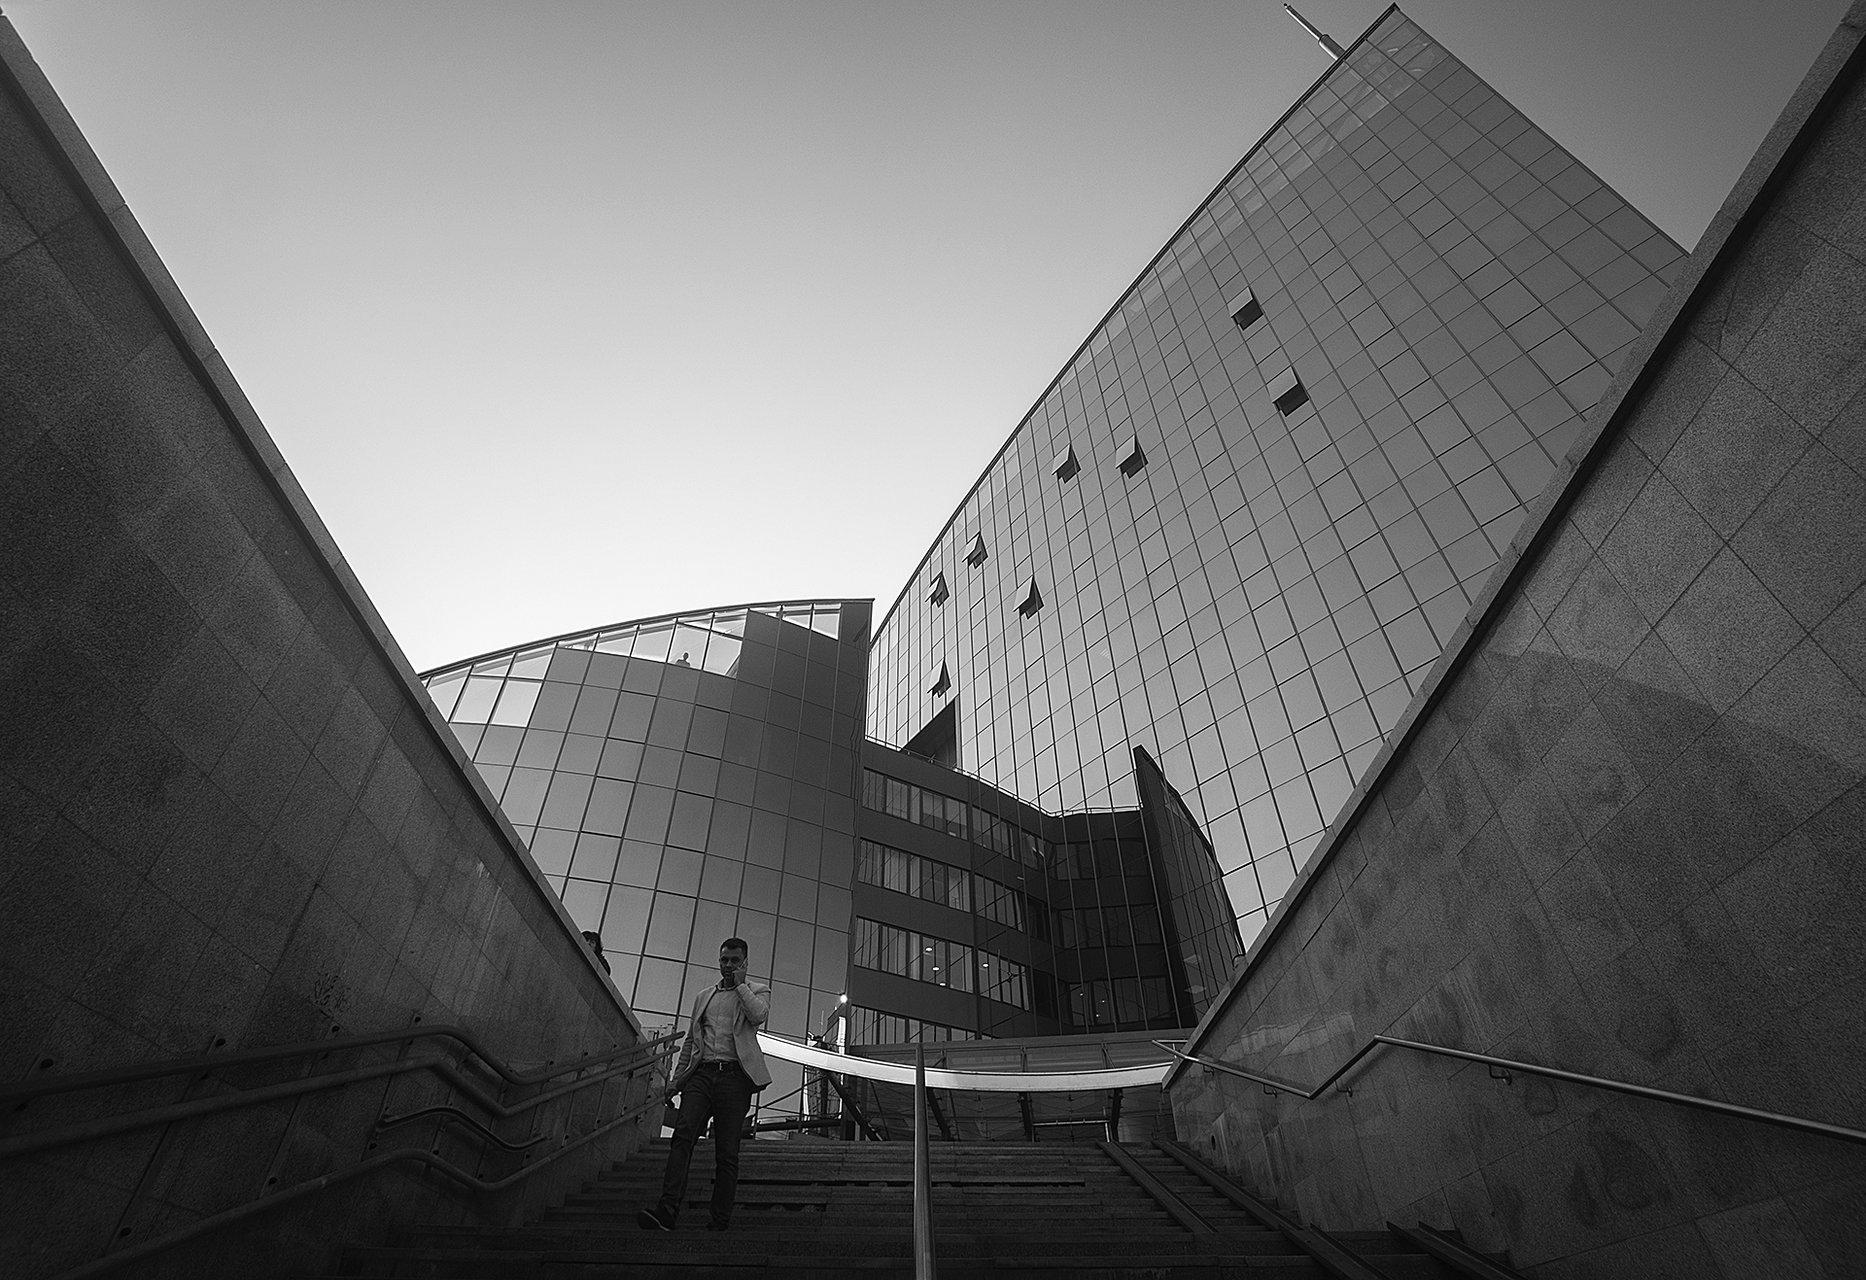 Photo in In the city | Author Valentin Dotsev - valdo | PHOTO FORUM